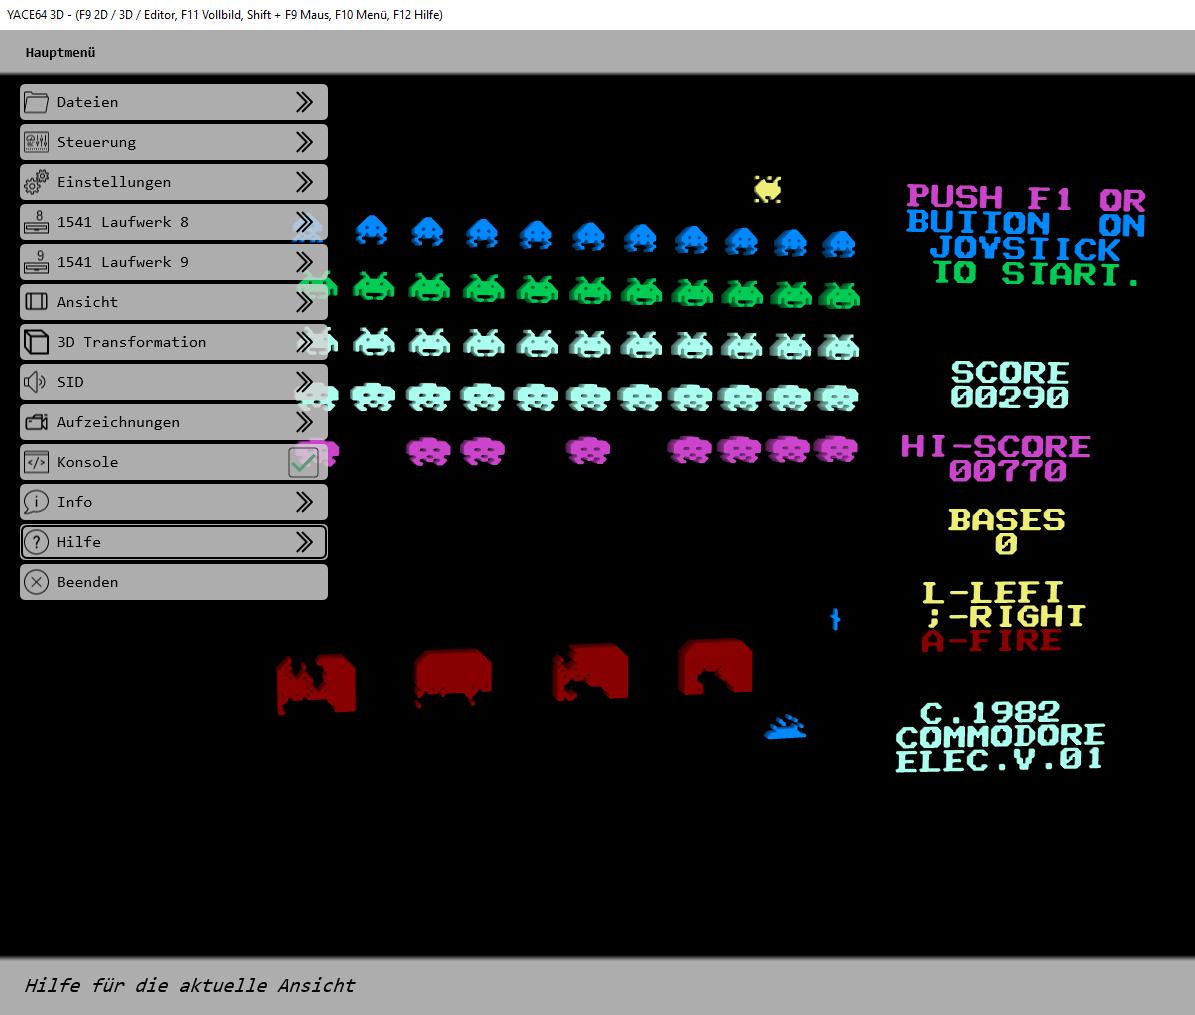 YACE64 - The Commodore 64 Emulator